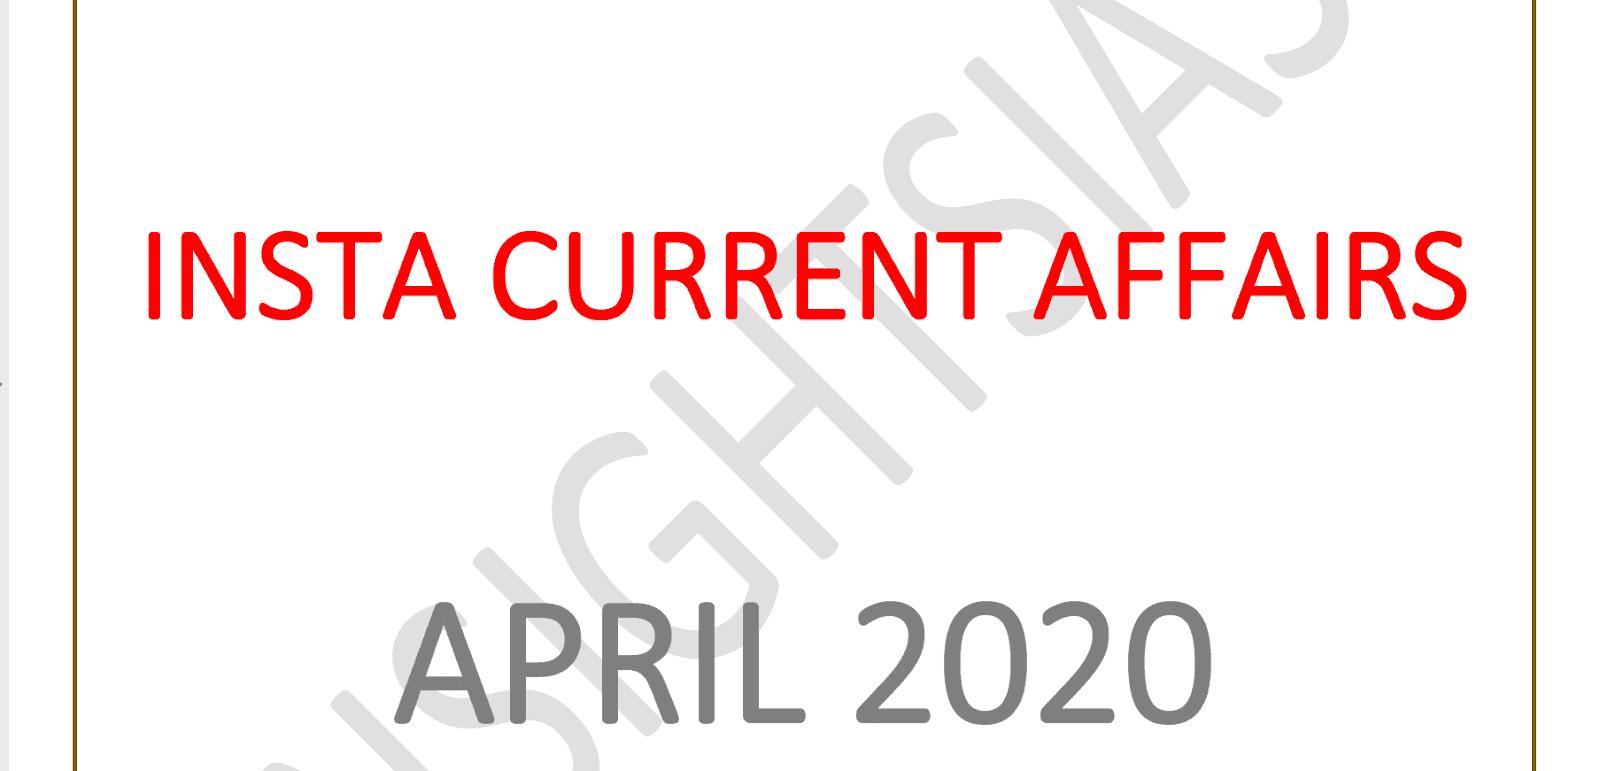 InsightsIAS Current Affairs April 2020